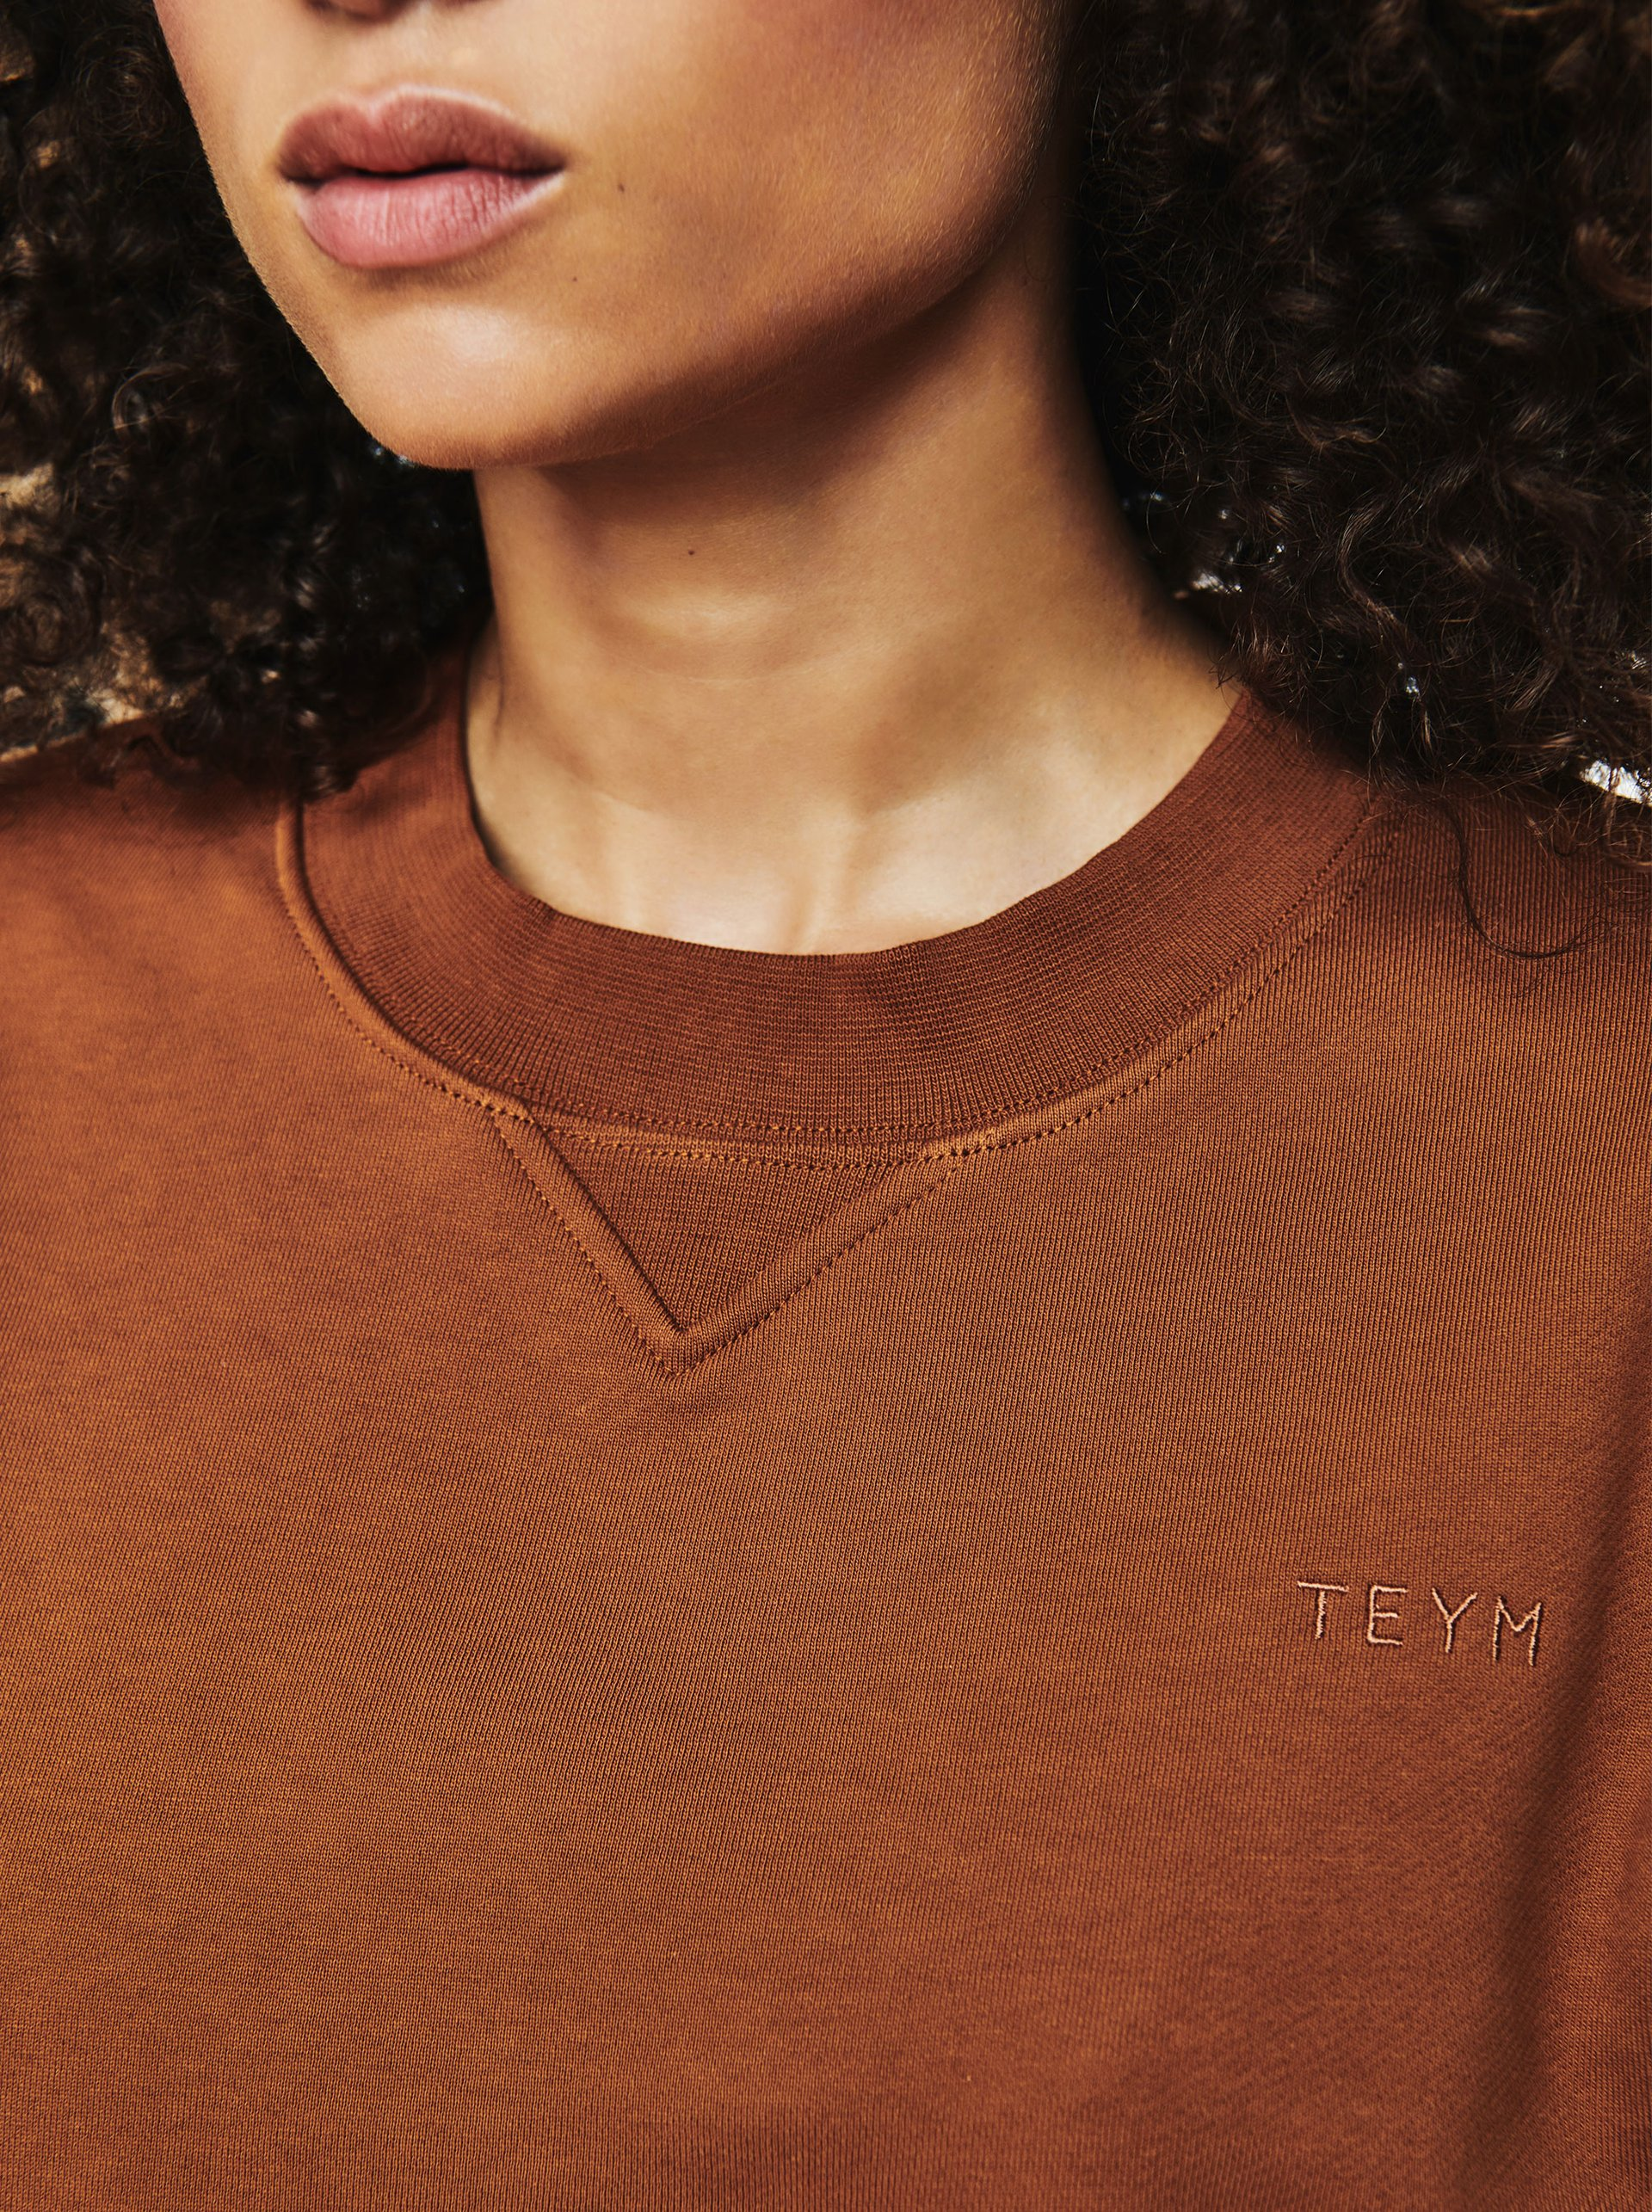 Teym-TheSweatshirt-Women-Camel02